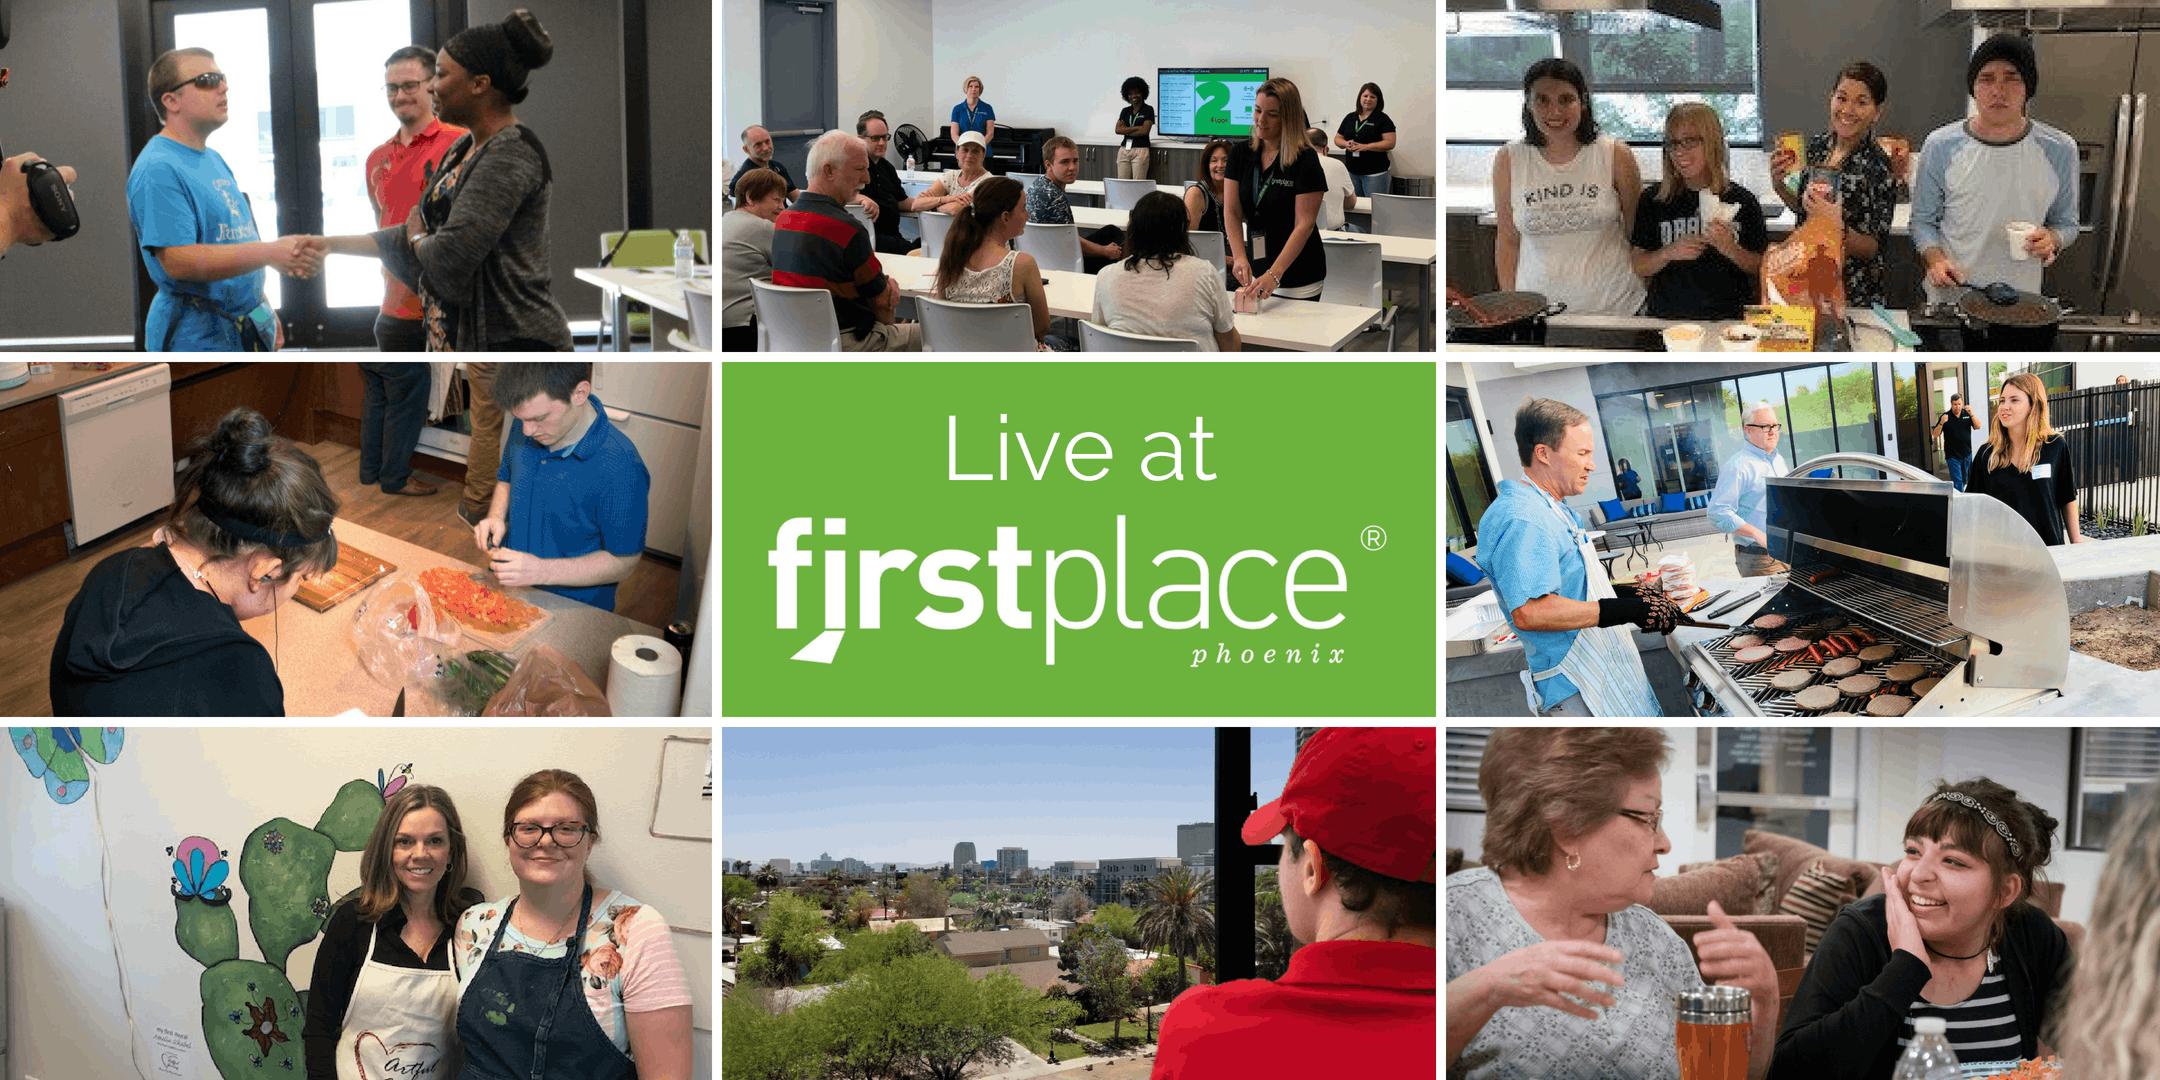 Explore First Place–Phoenix - December 13